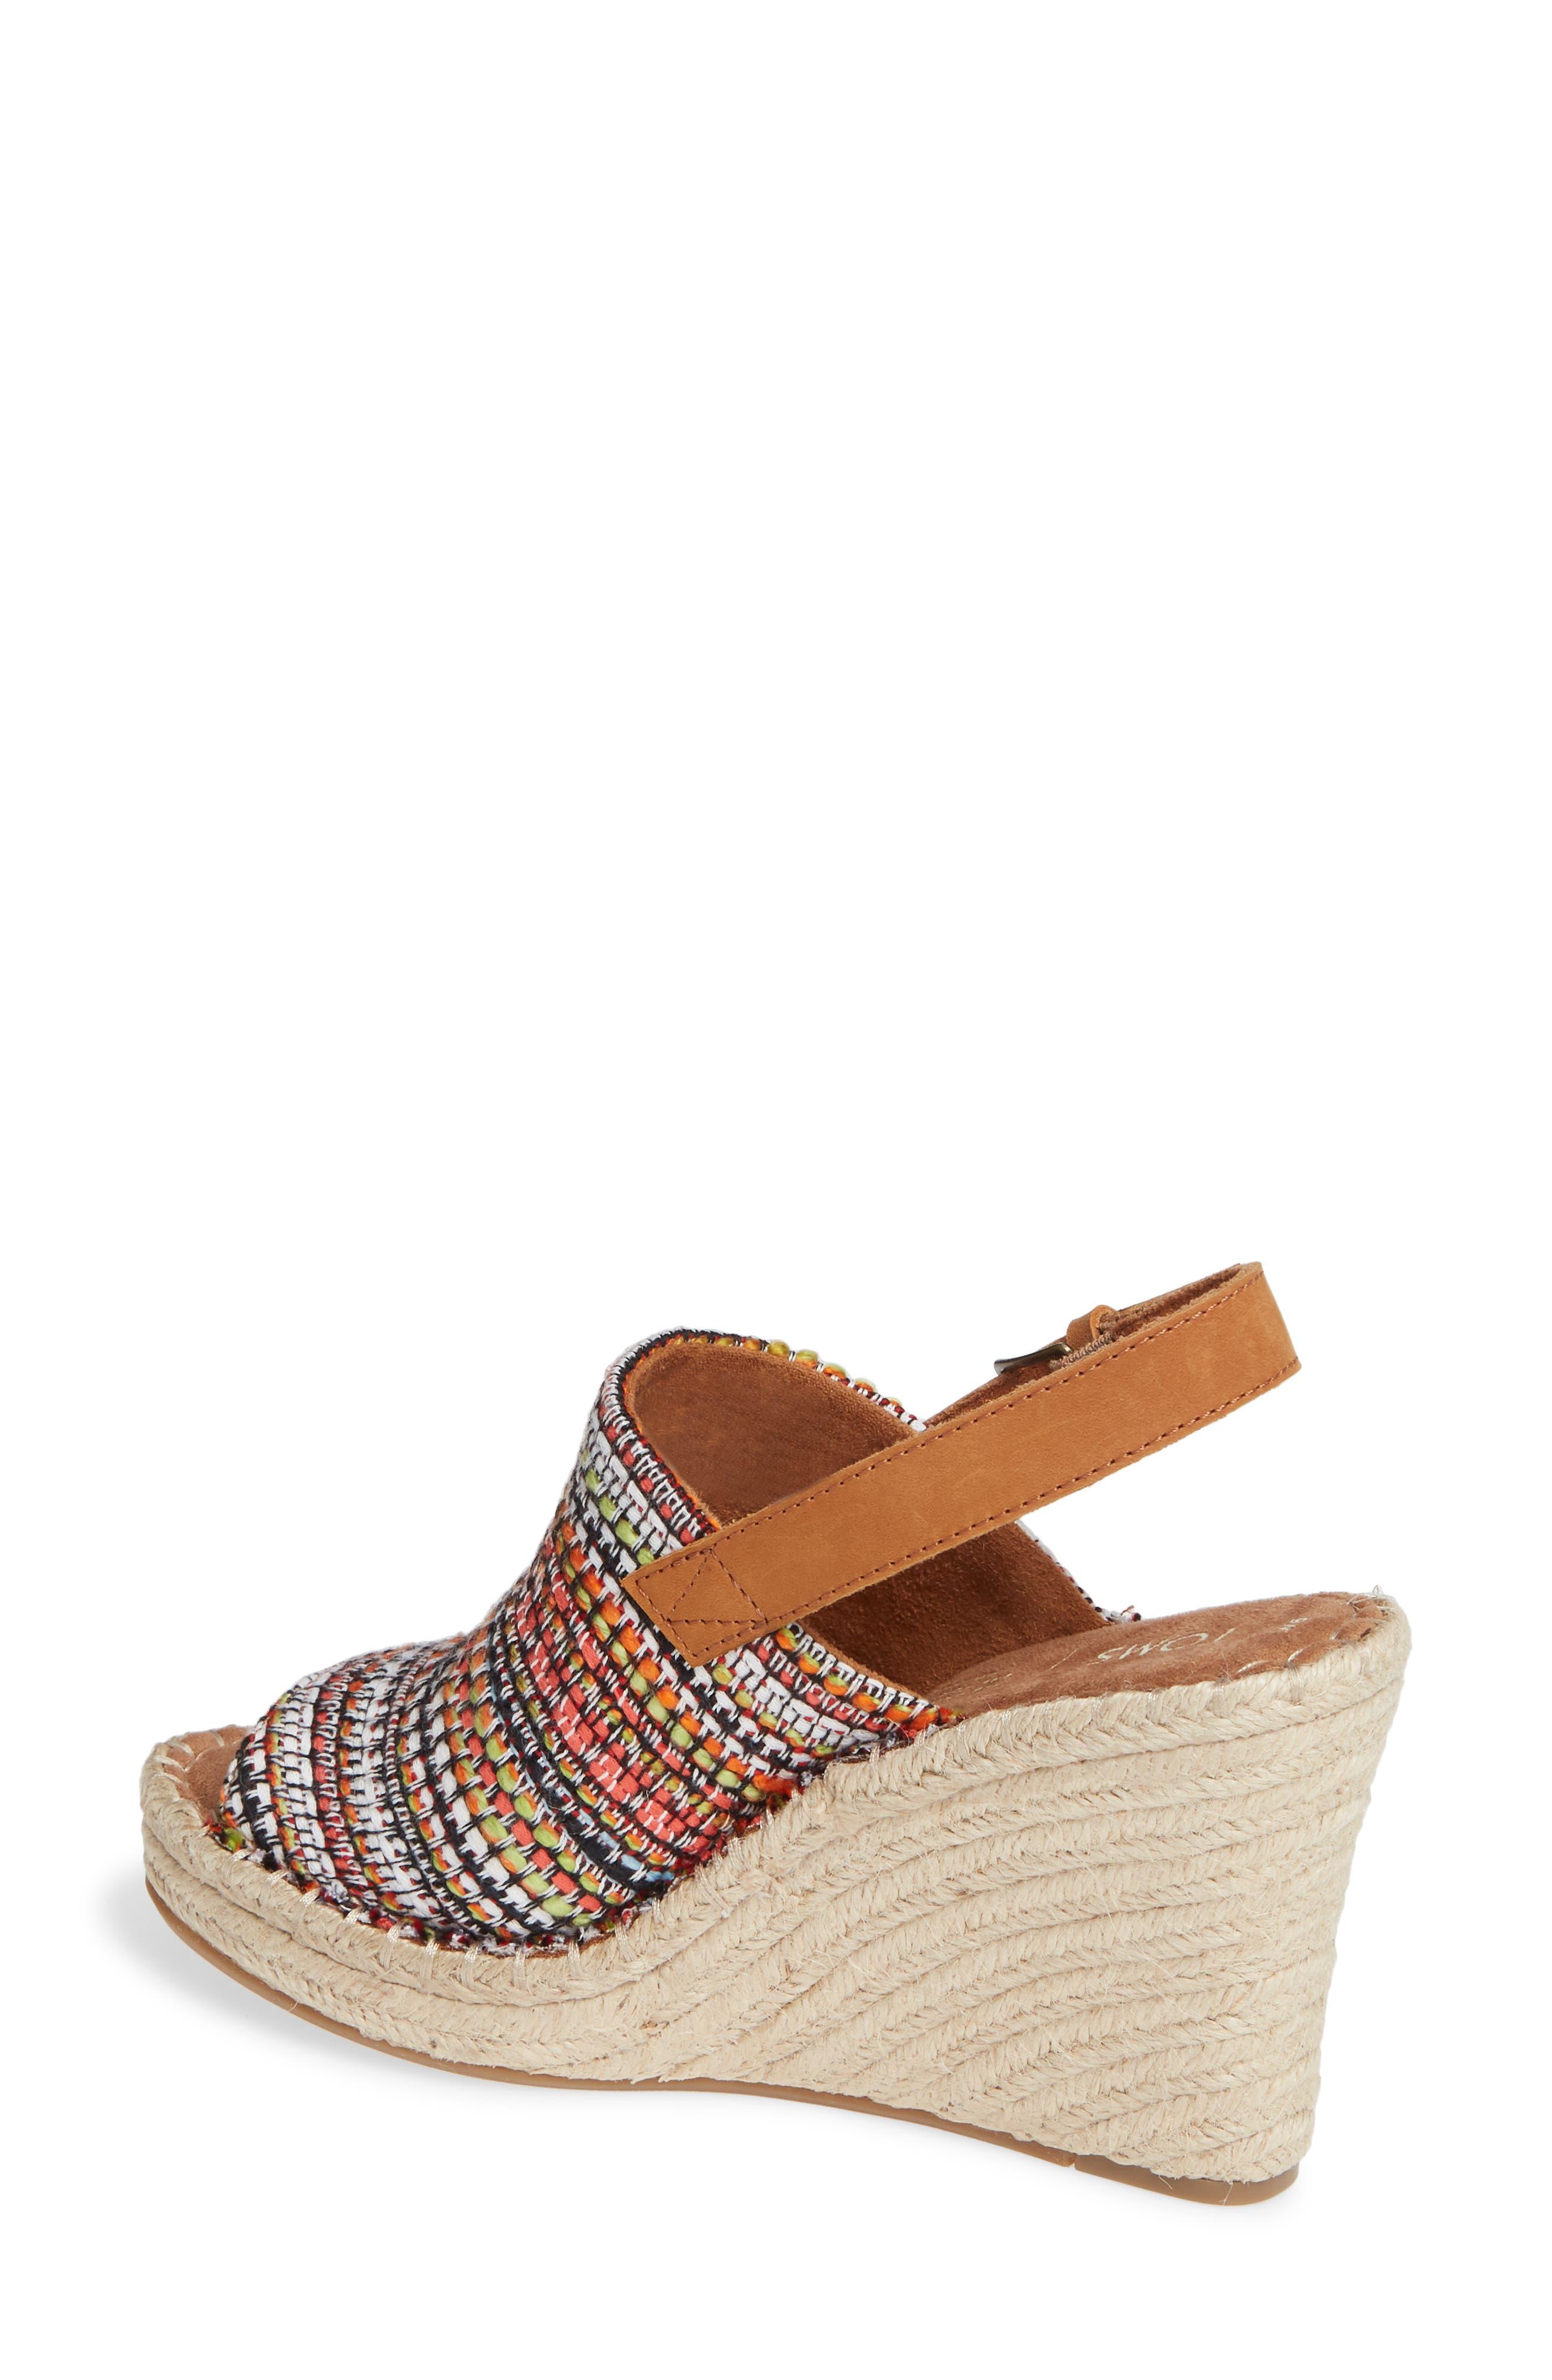 35ddb9ef51a TOMS Women s Sandals